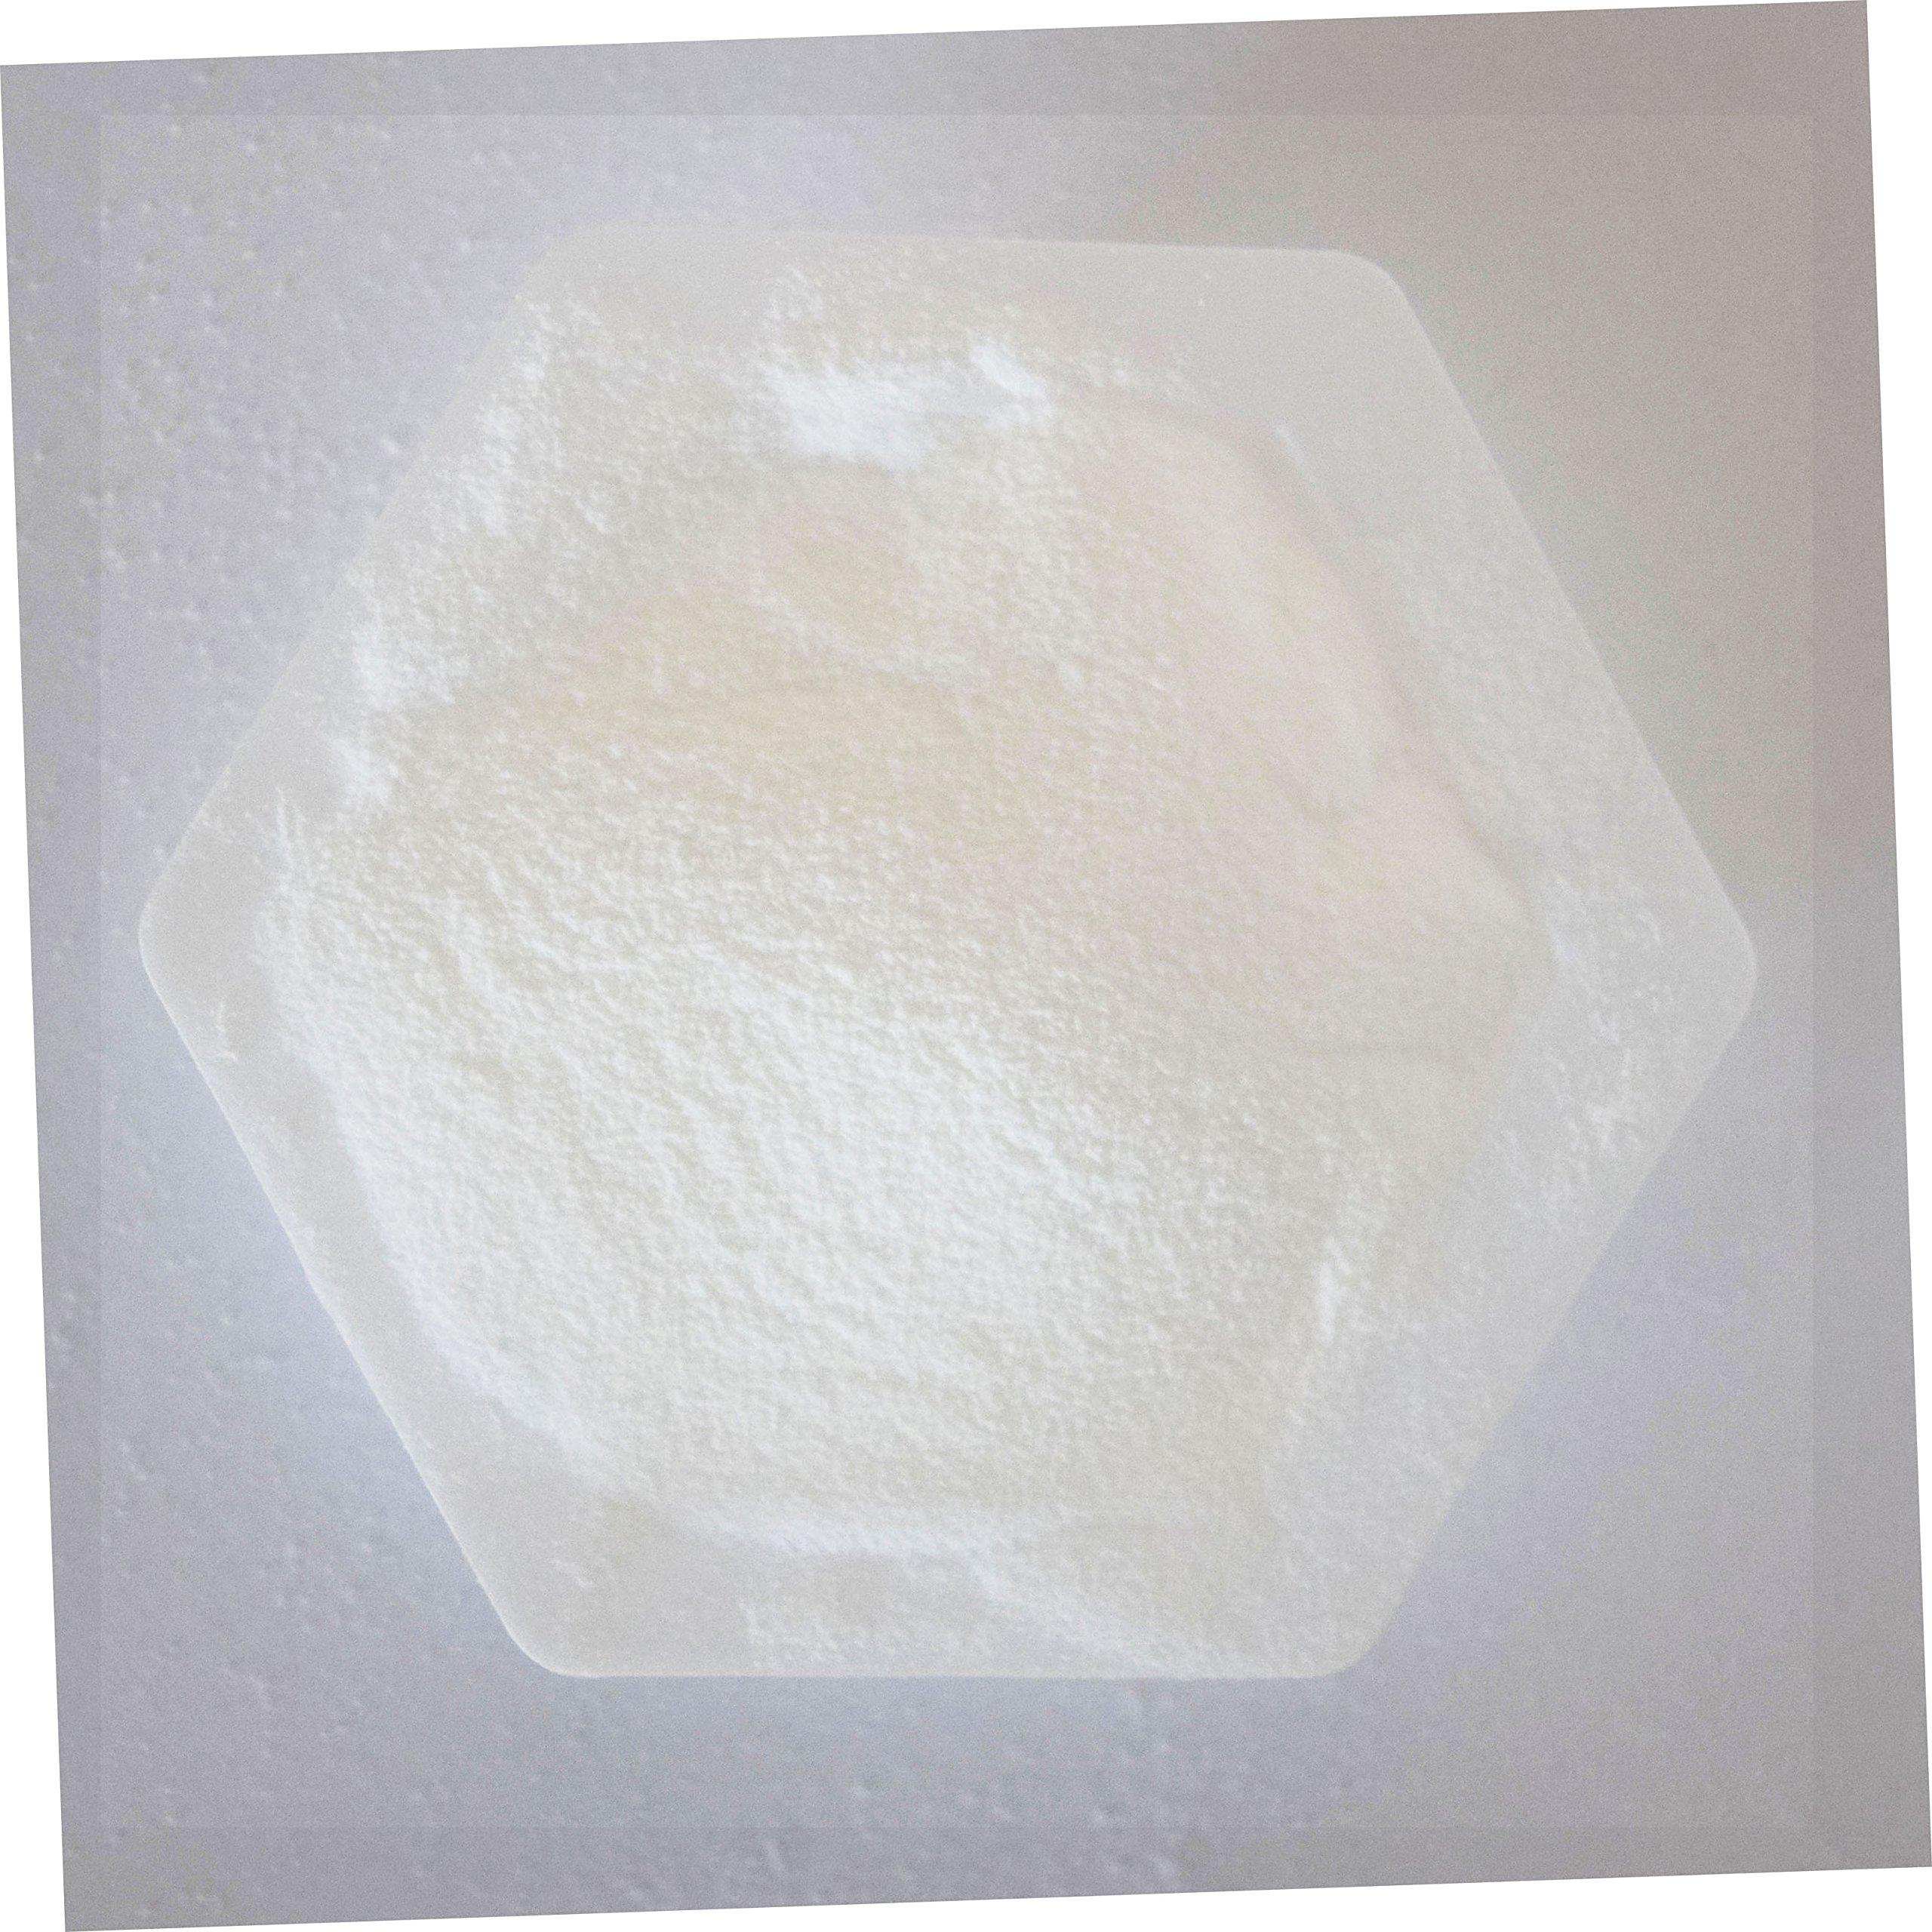 (2-Hydroxypropyl)-Beta-Cyclodextrin, 99.5%min, 25 Grams, Holiday Sale